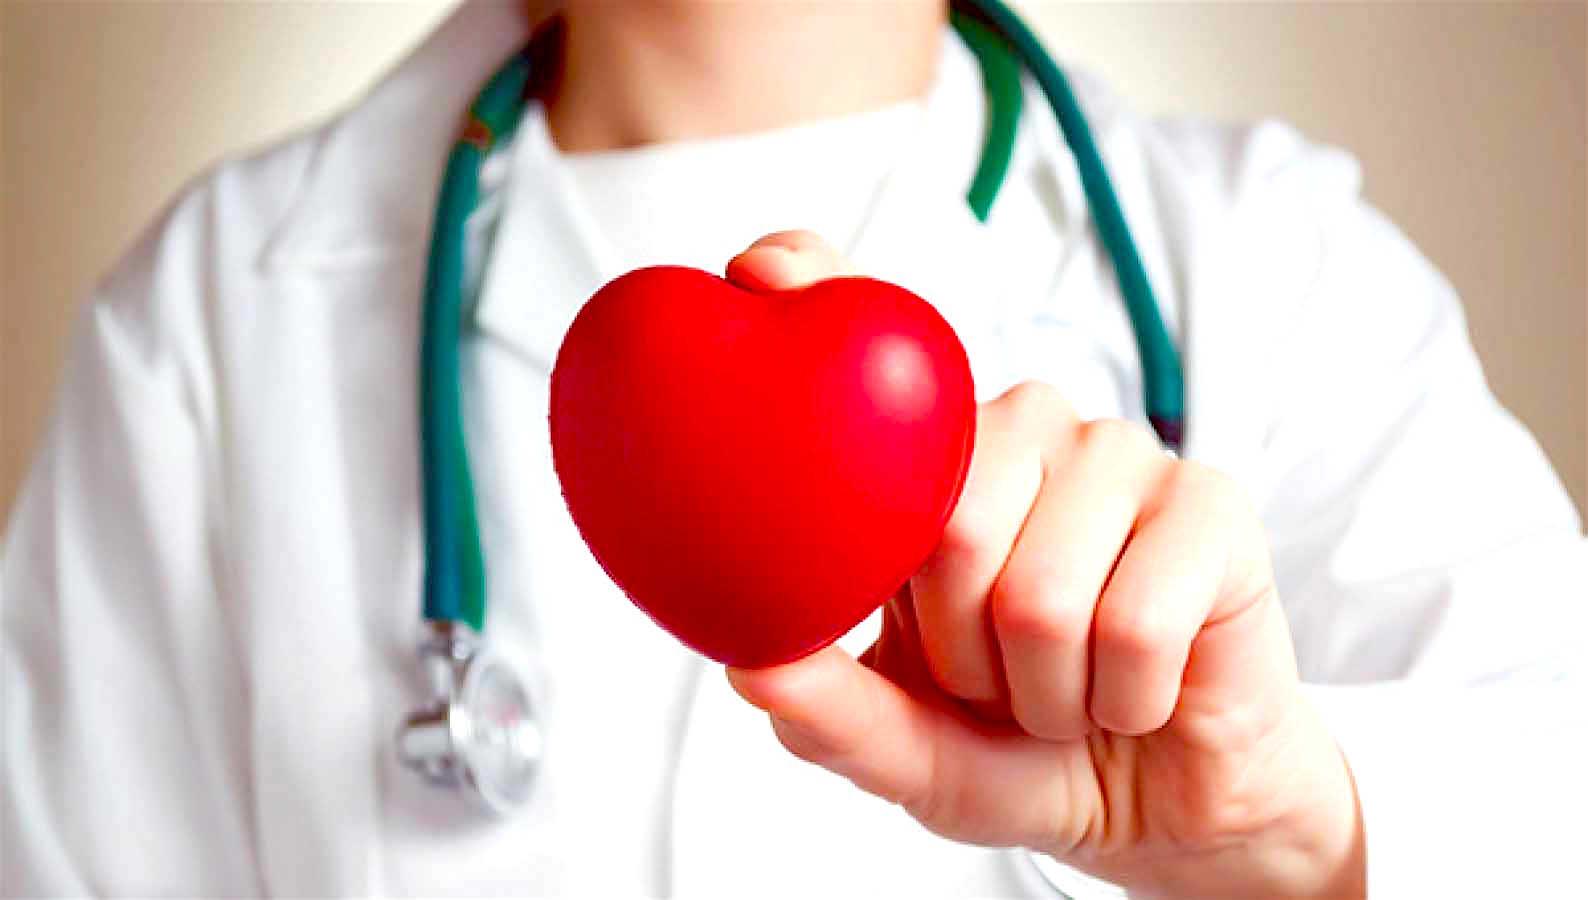 Médico sujetando un corazón artificial